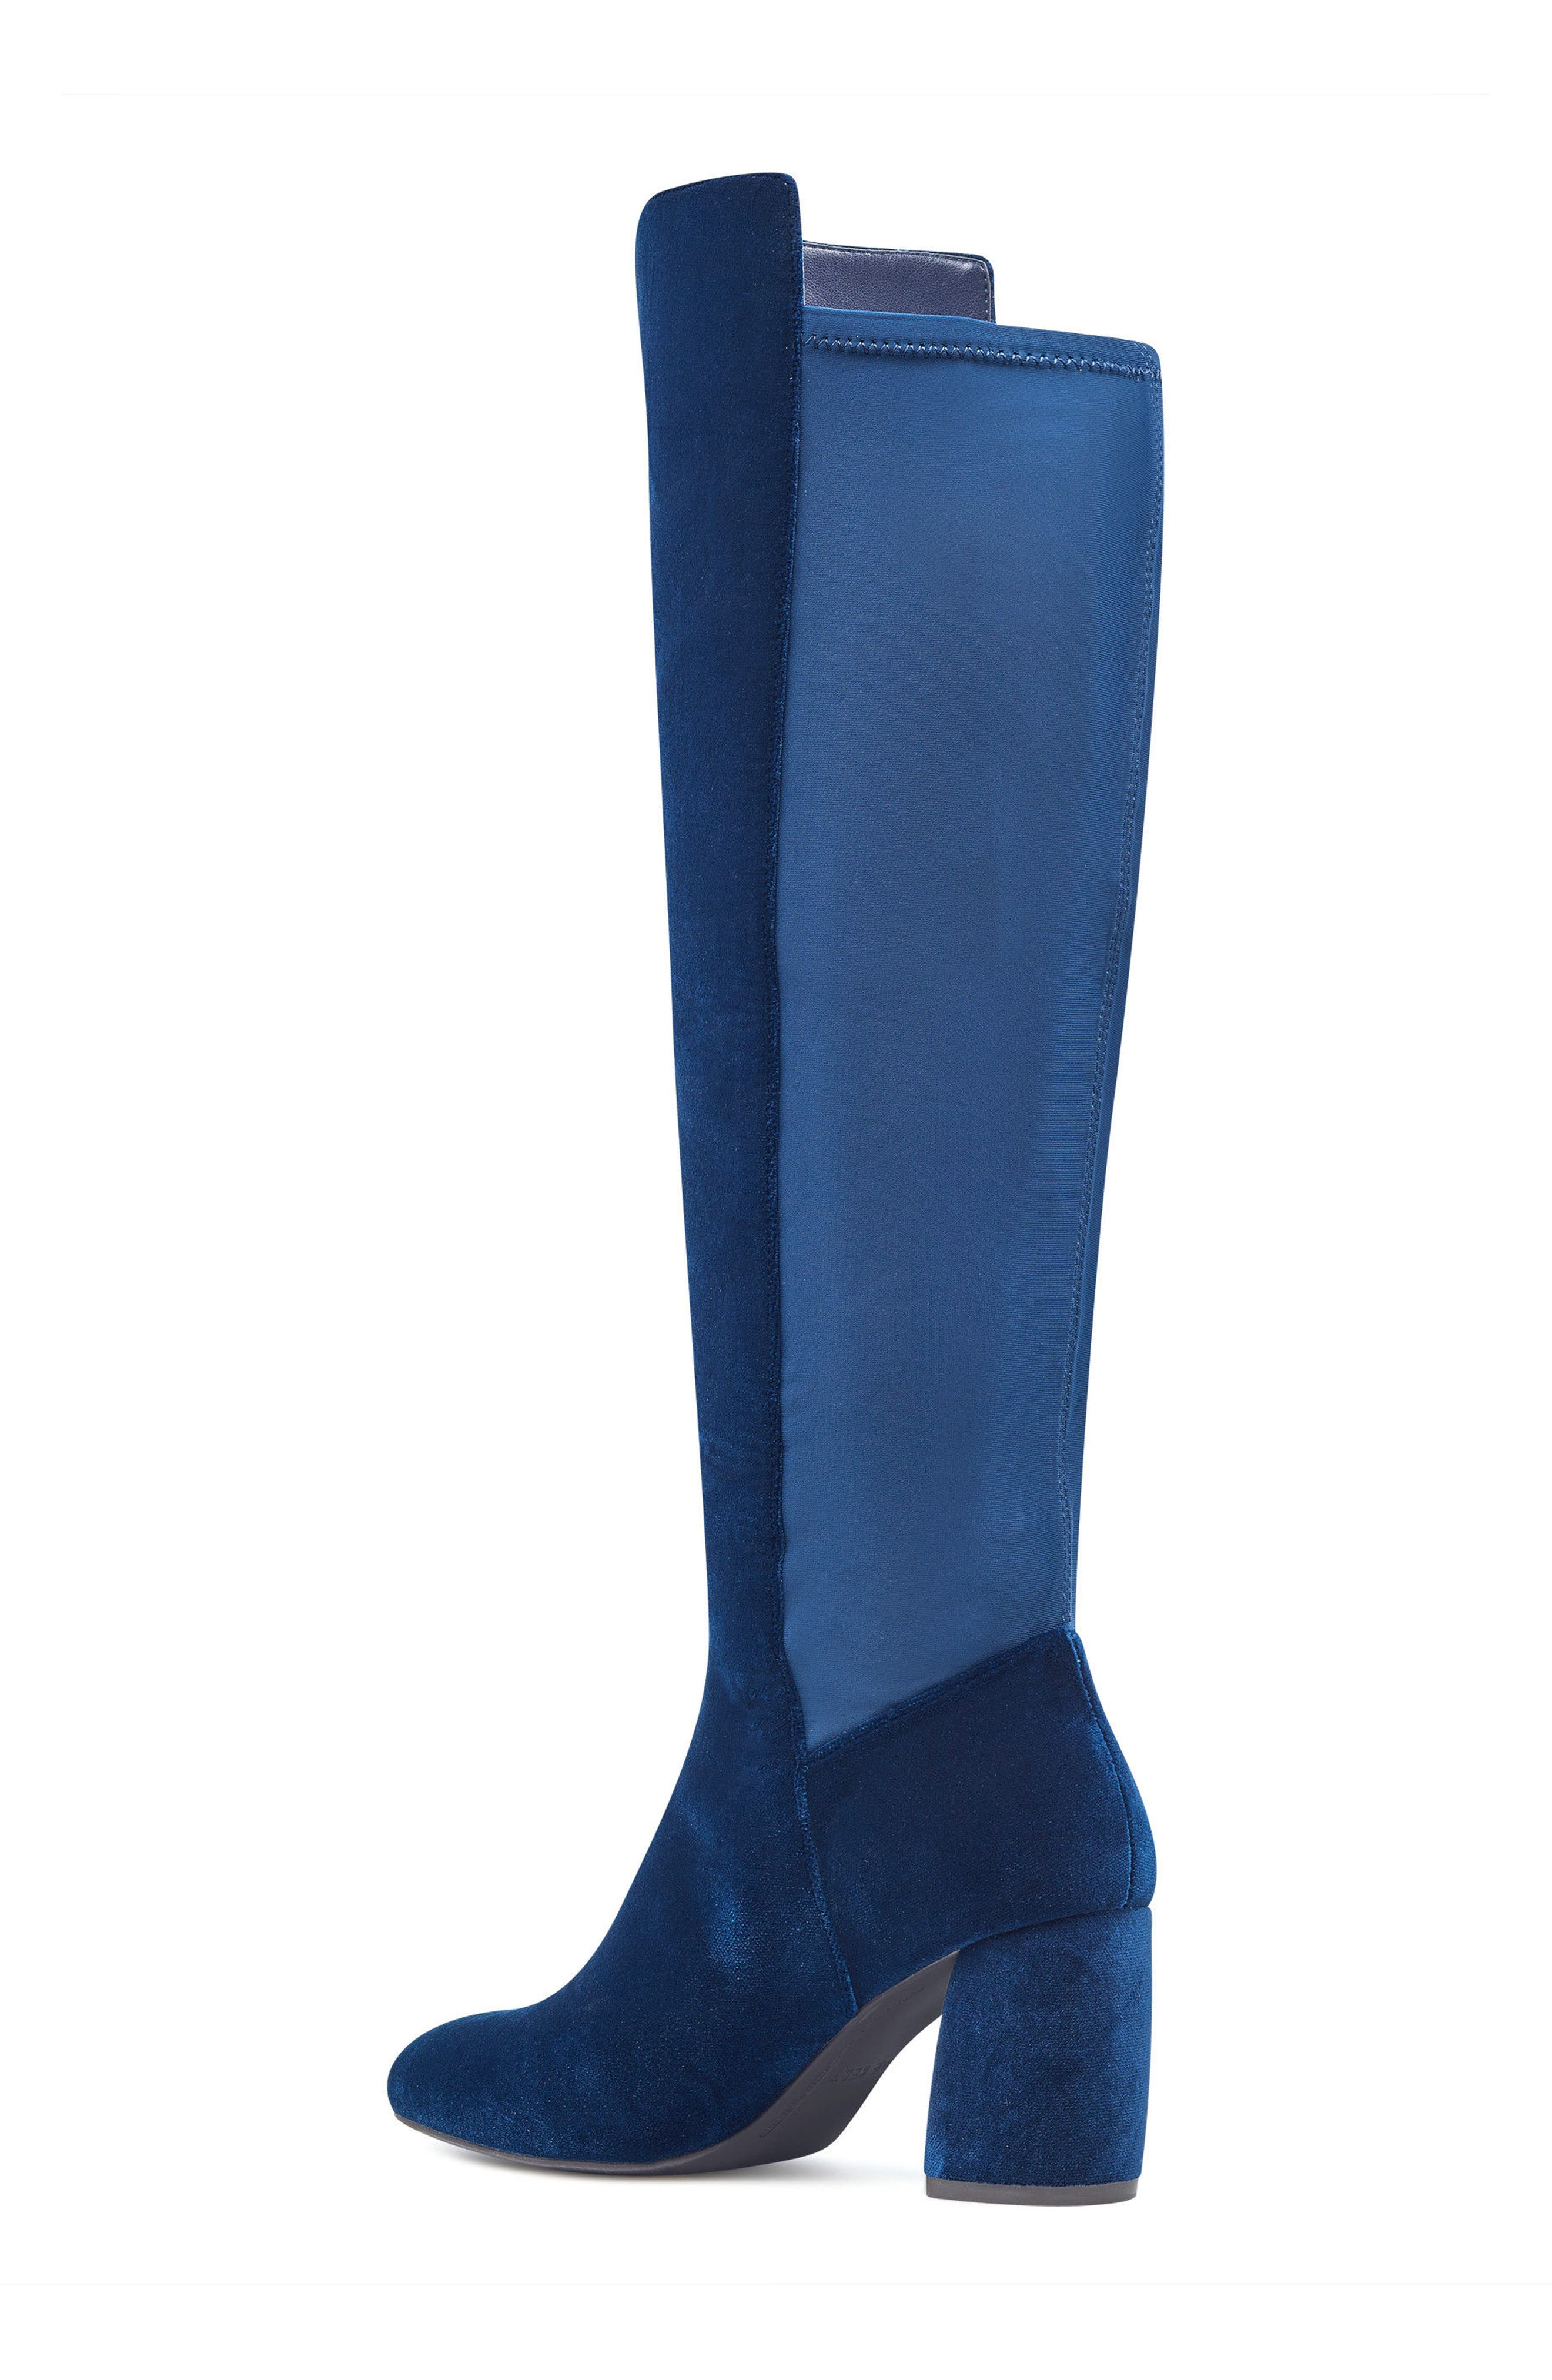 Kerianna Knee High Boot,                             Alternate thumbnail 2, color,                             Navy Fabric